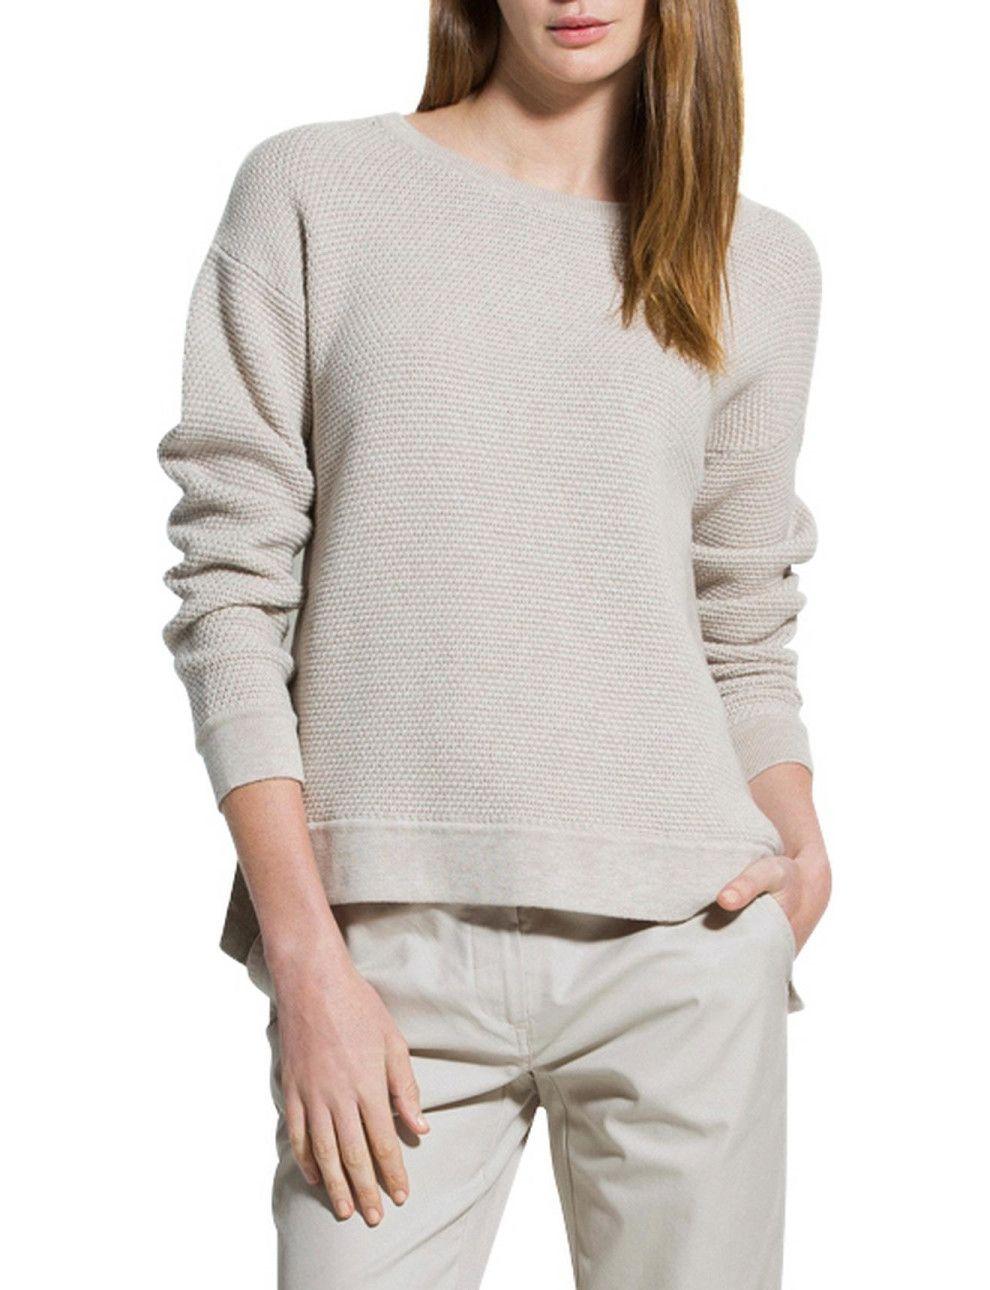 Textured Splice Knit | David Jones | Fashion online shop ...